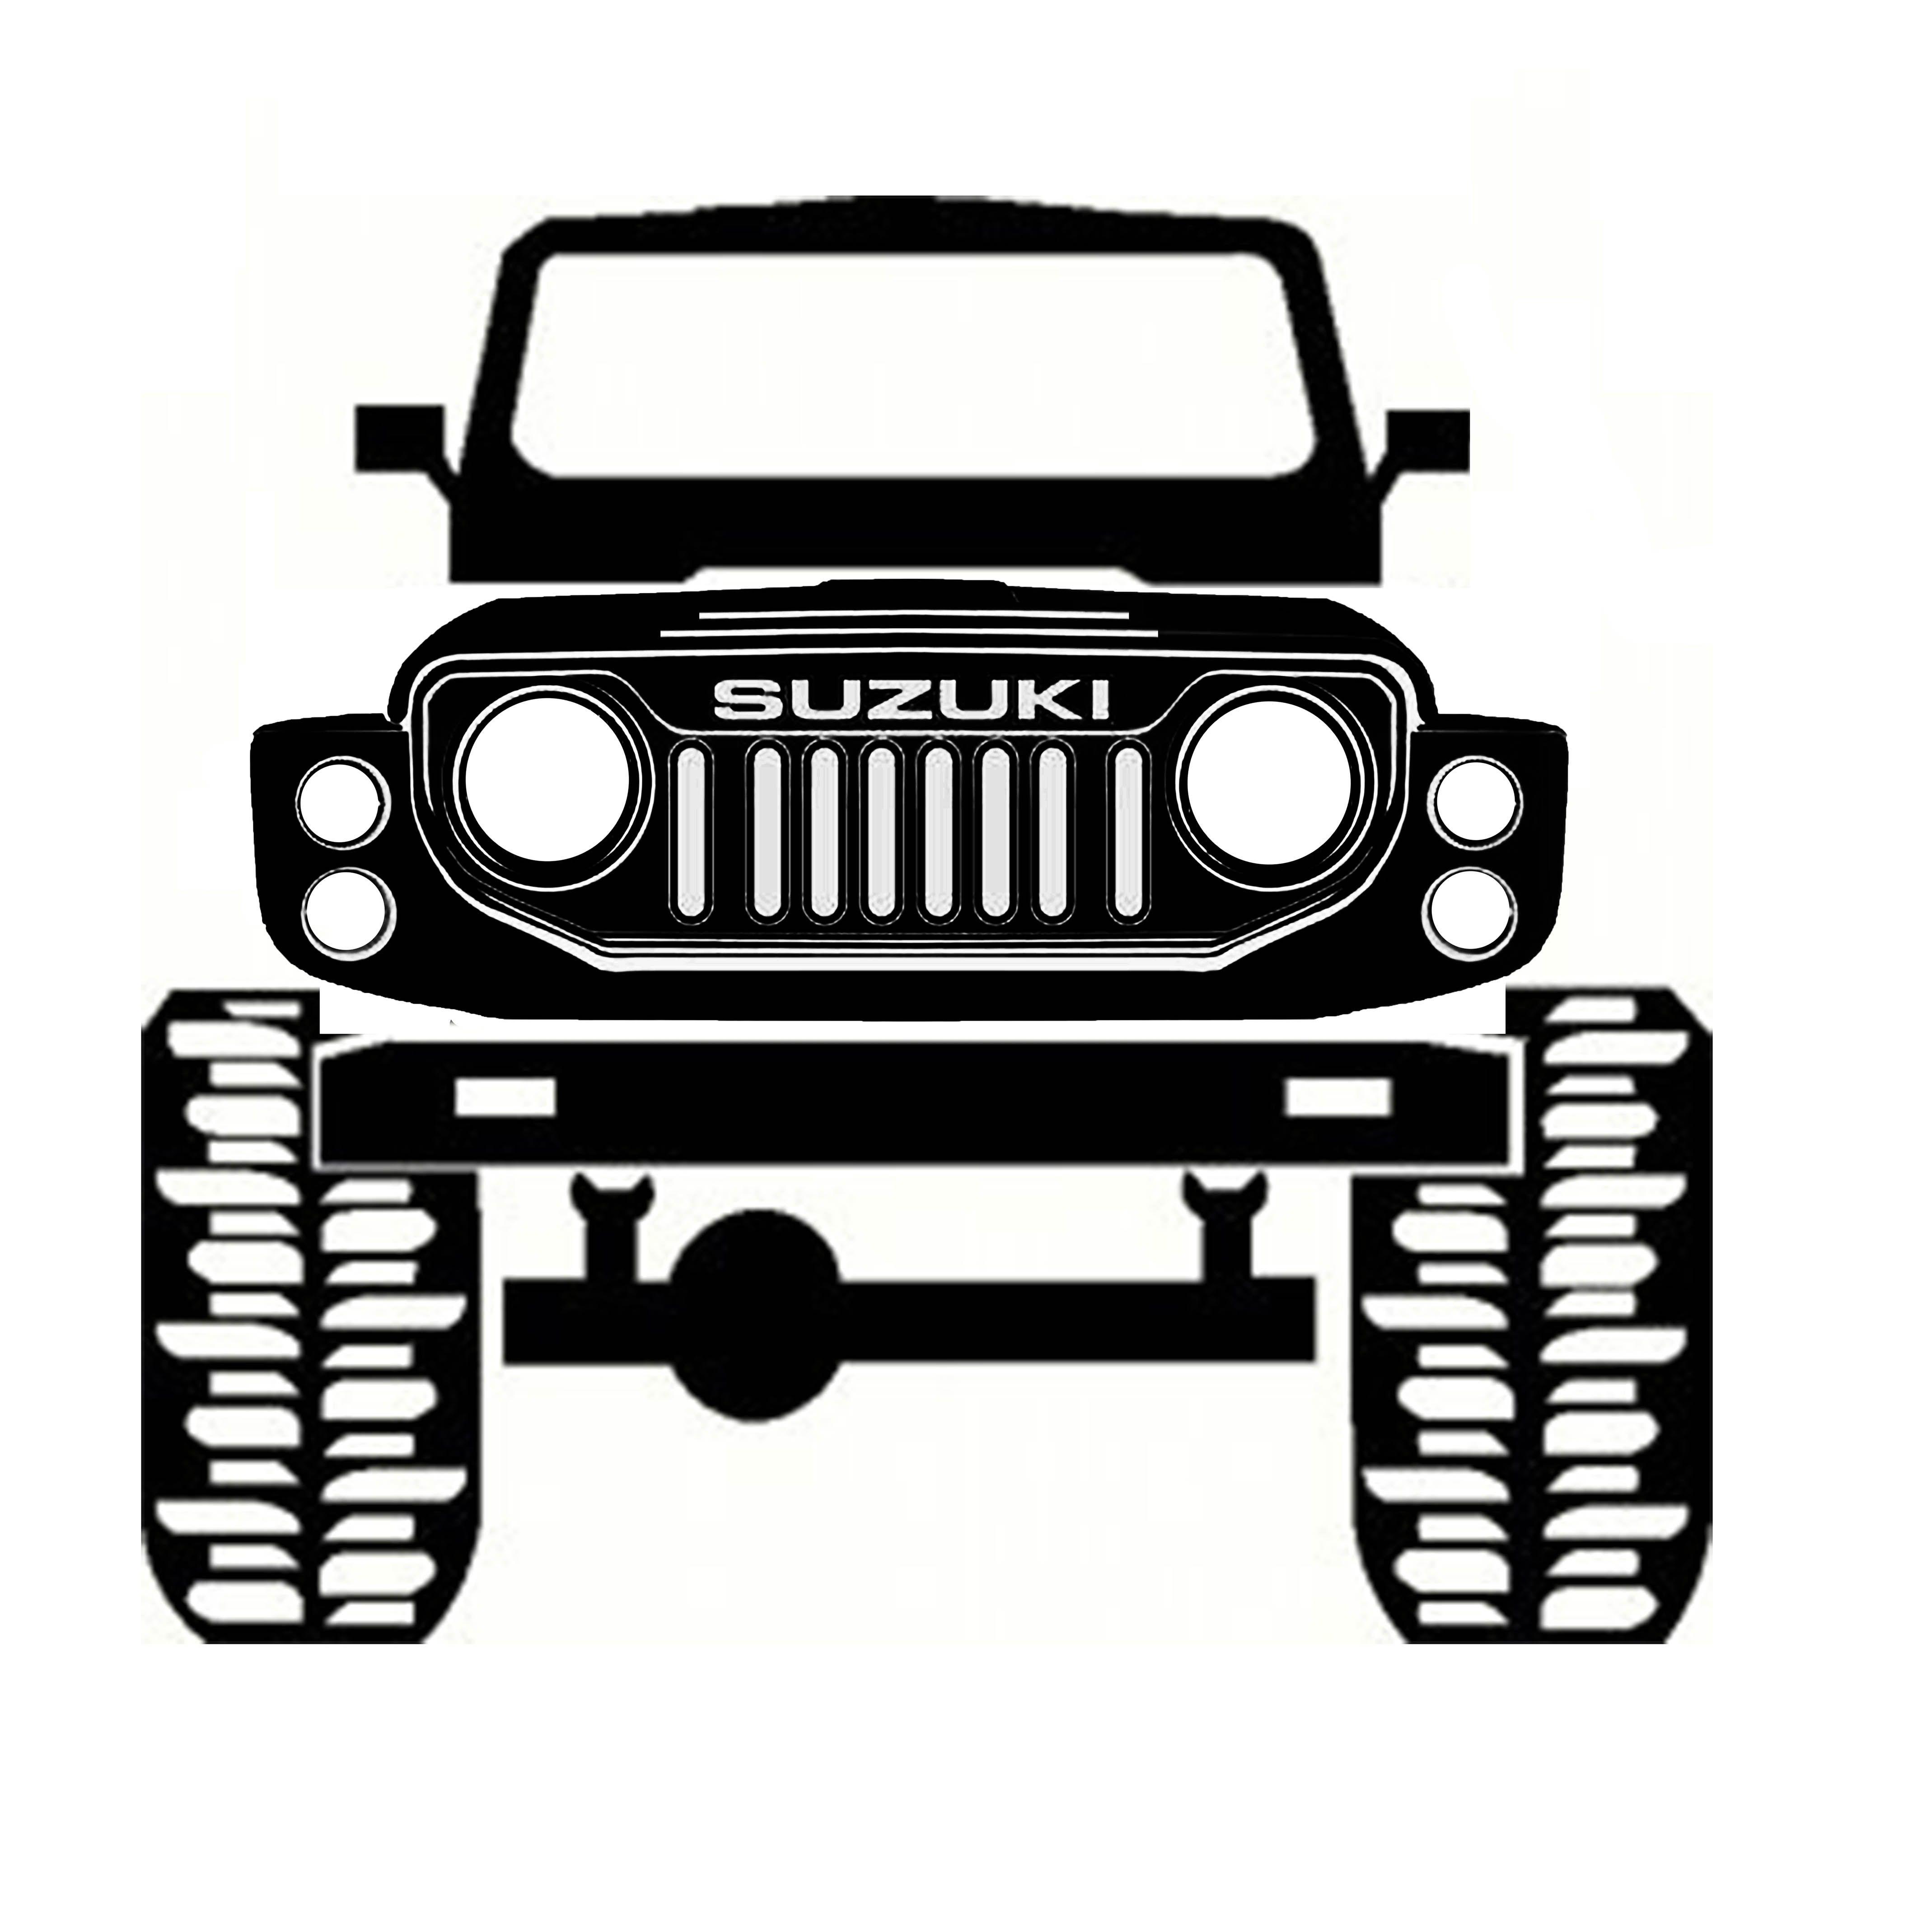 Samurai | Modifikasi mobil, Mobil, Kartun  |Cartoon Suzuki Samurai